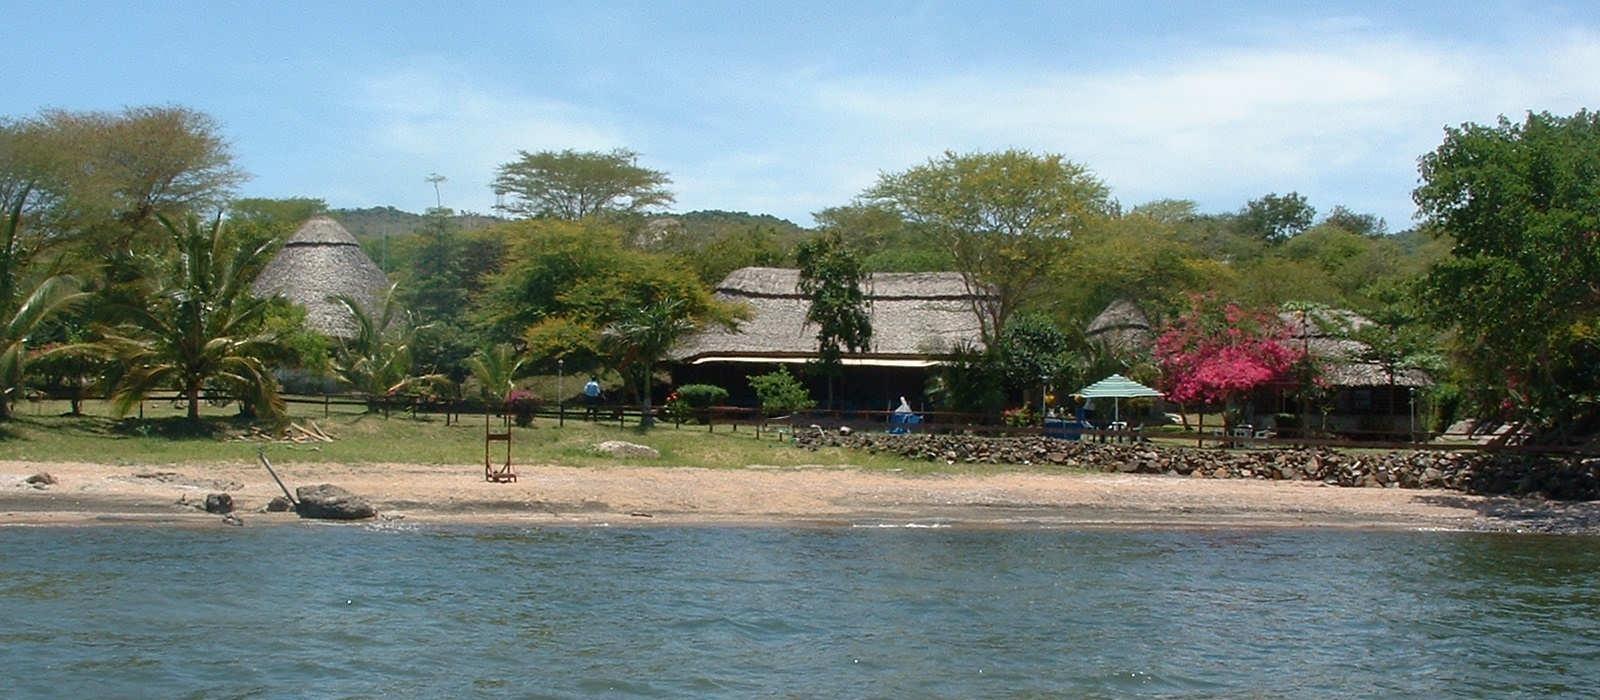 Lake Victoria Safari Village near Mbita